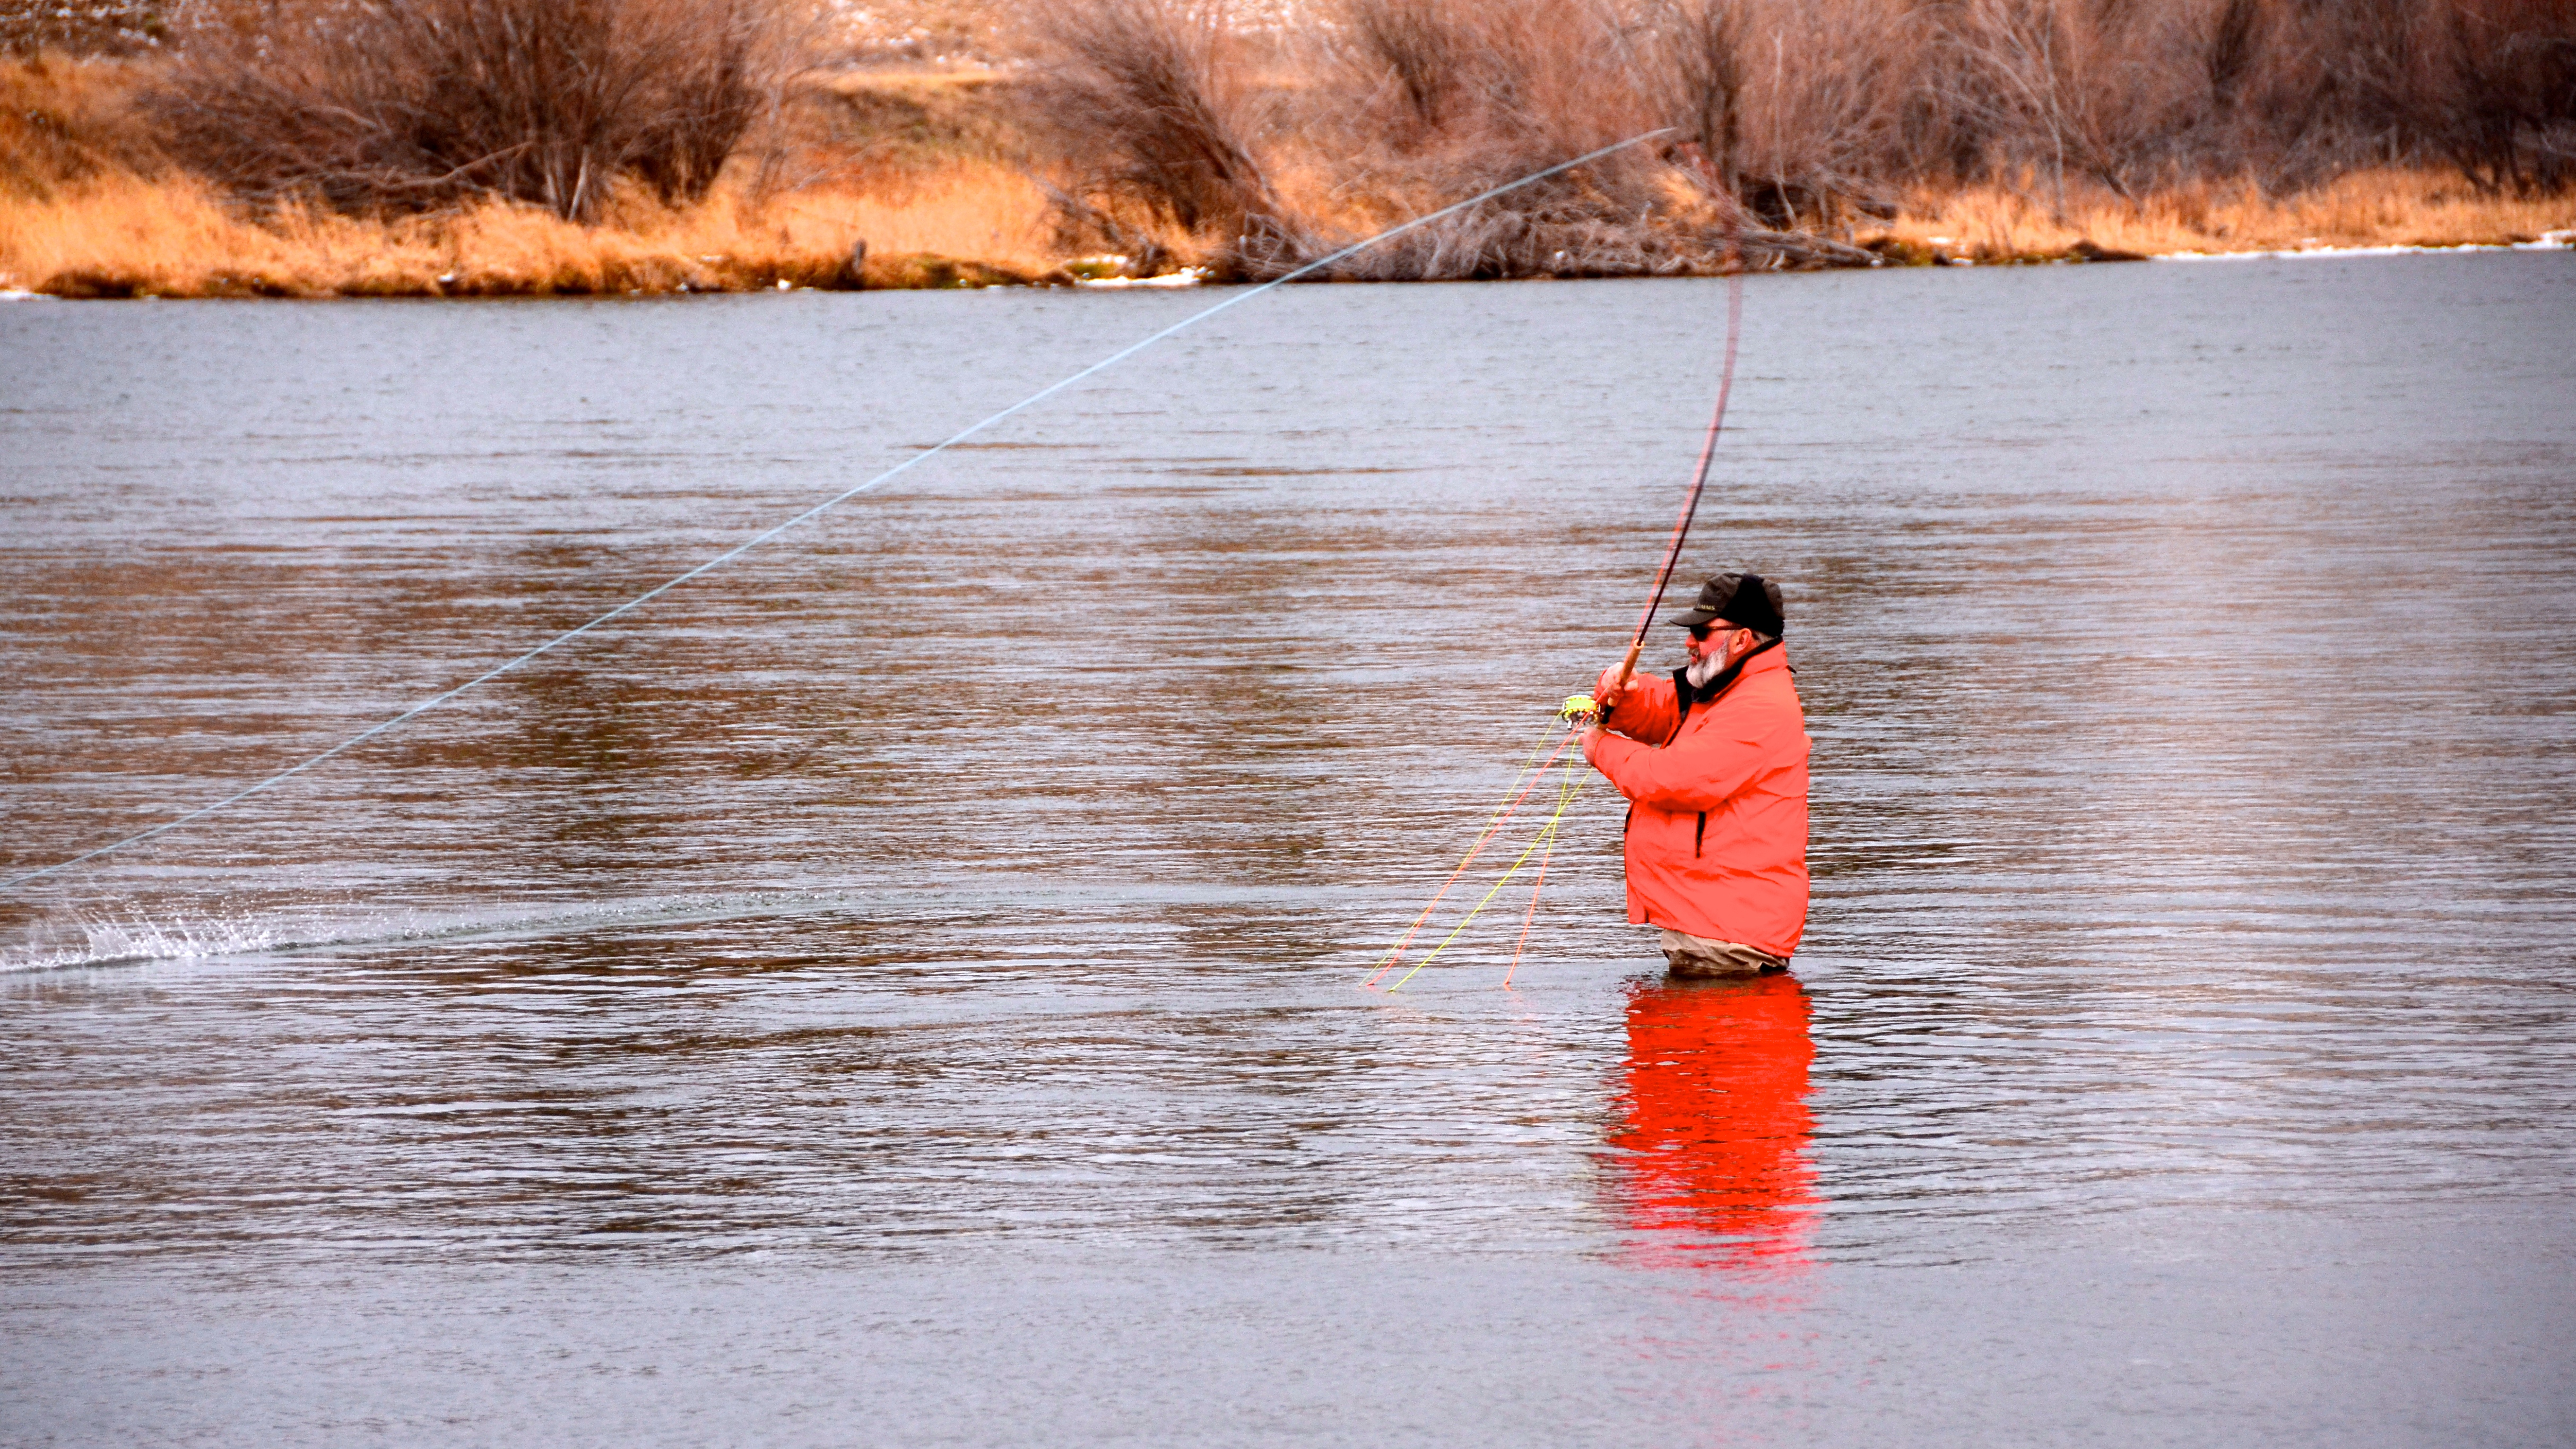 Missouri River Winter Solstice Fishing Report 12.21.14